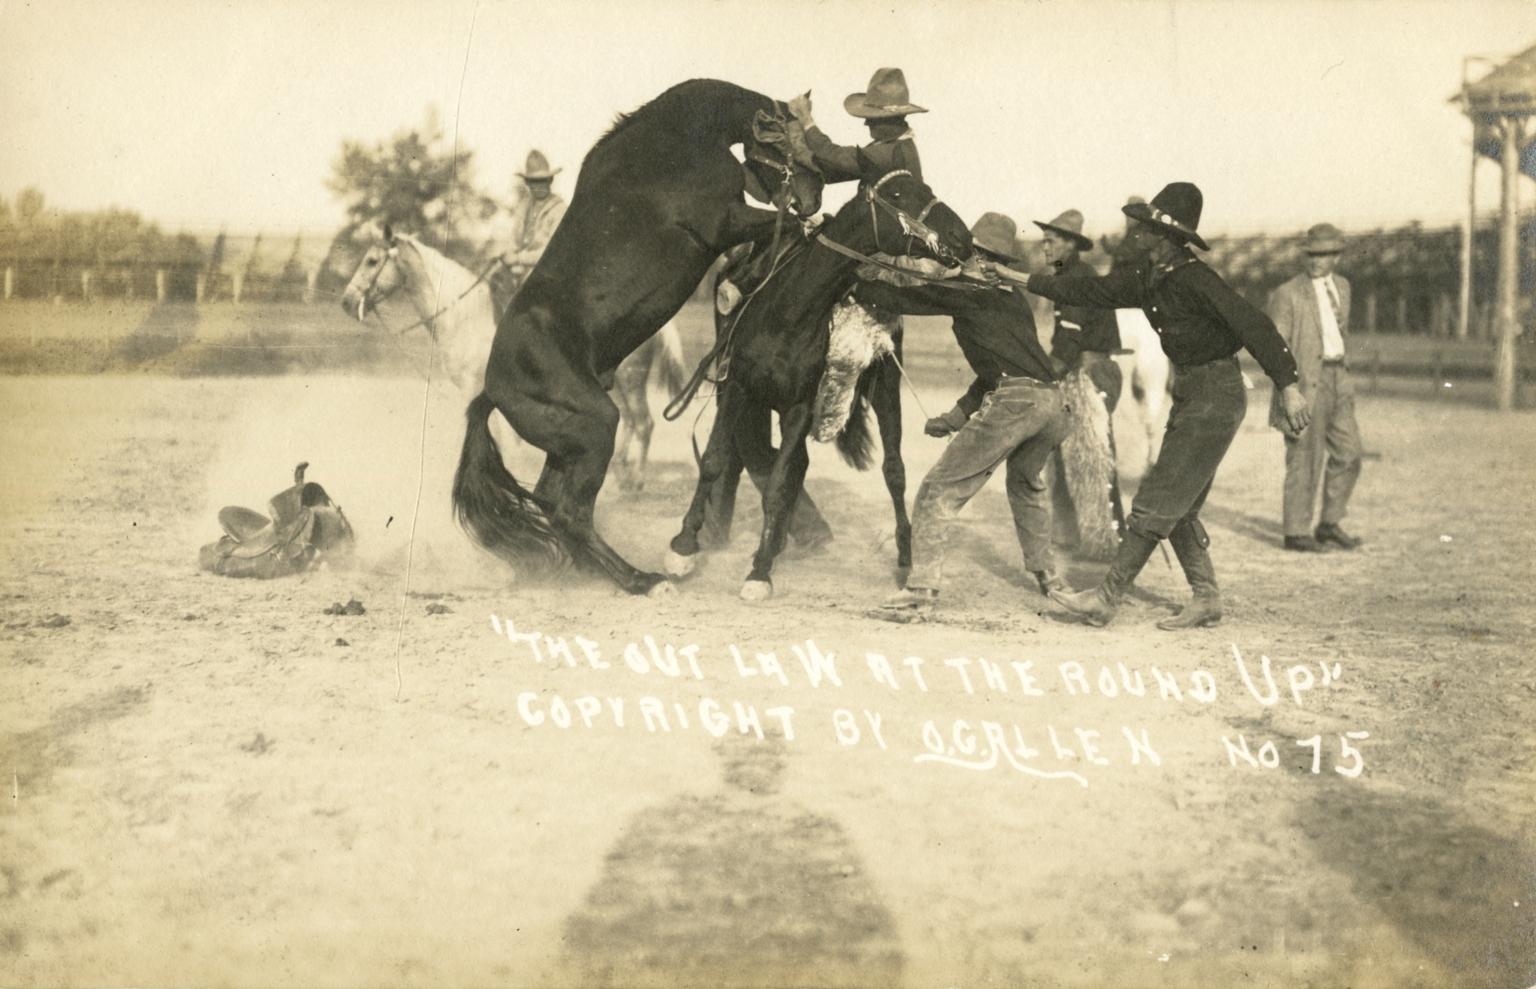 Men blindfolding a bronco after rodeo event